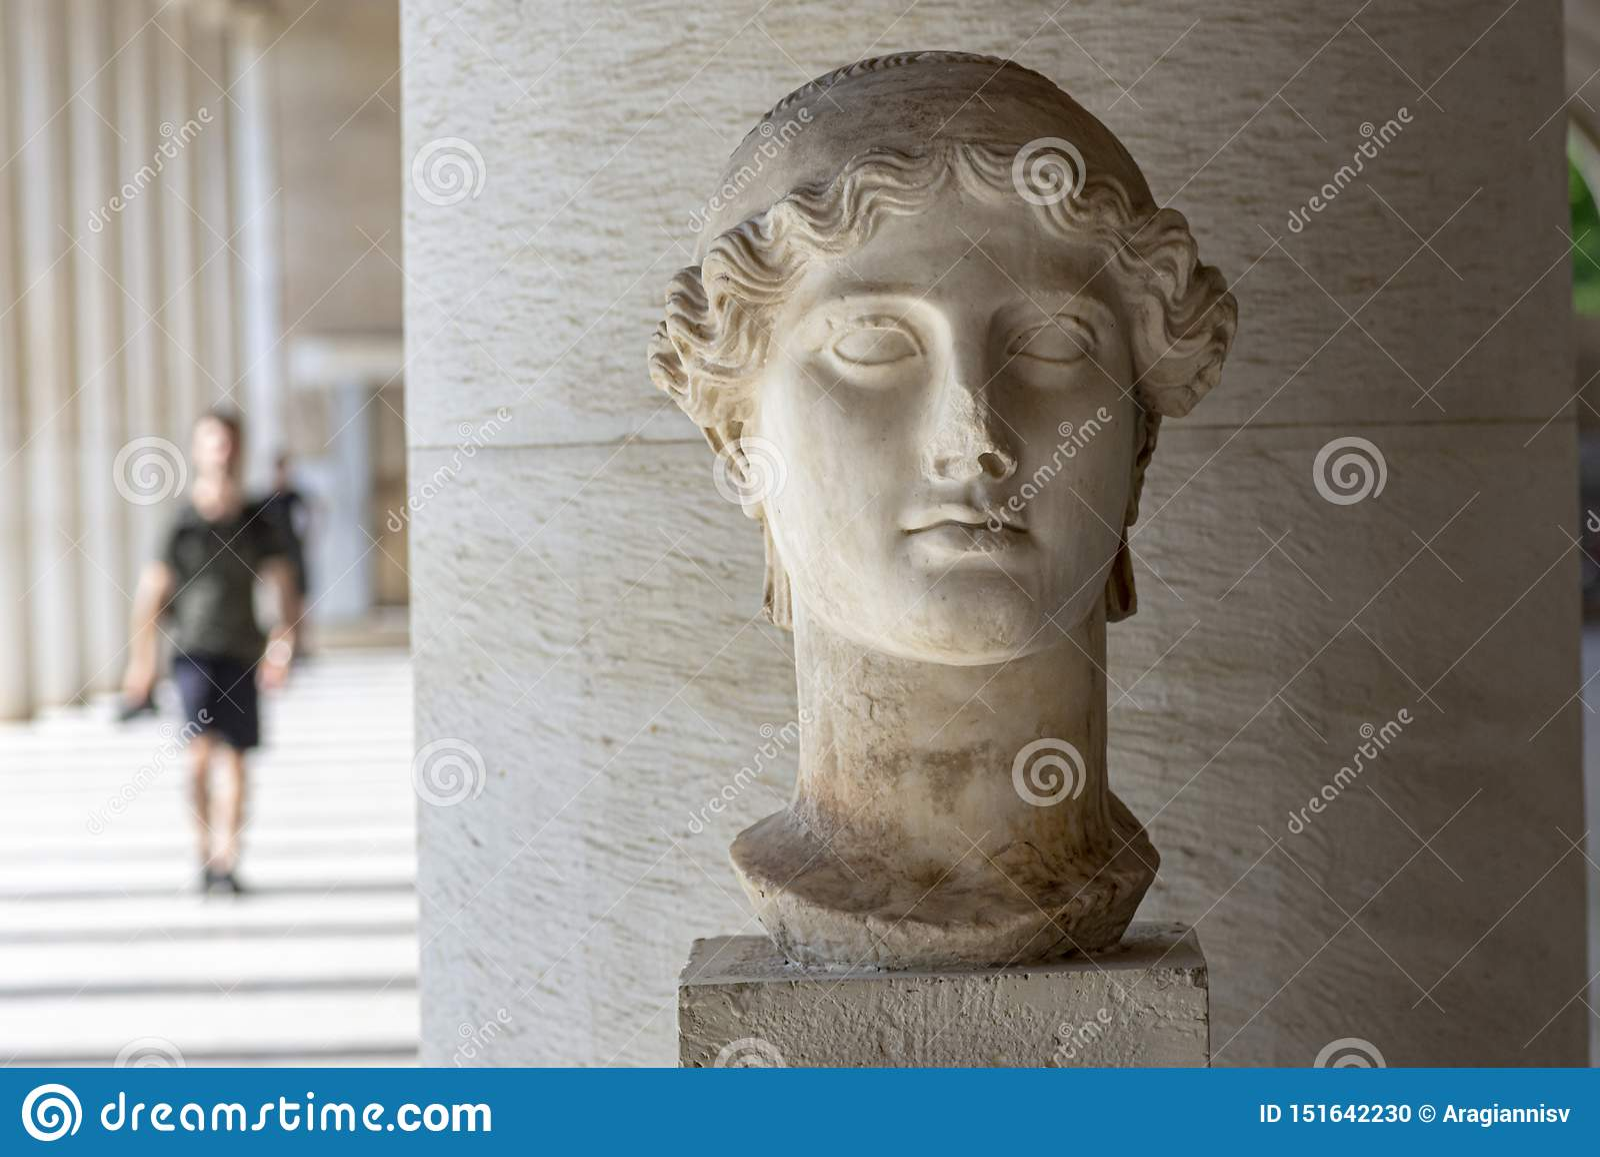 Estatua de la diosa griega Nike